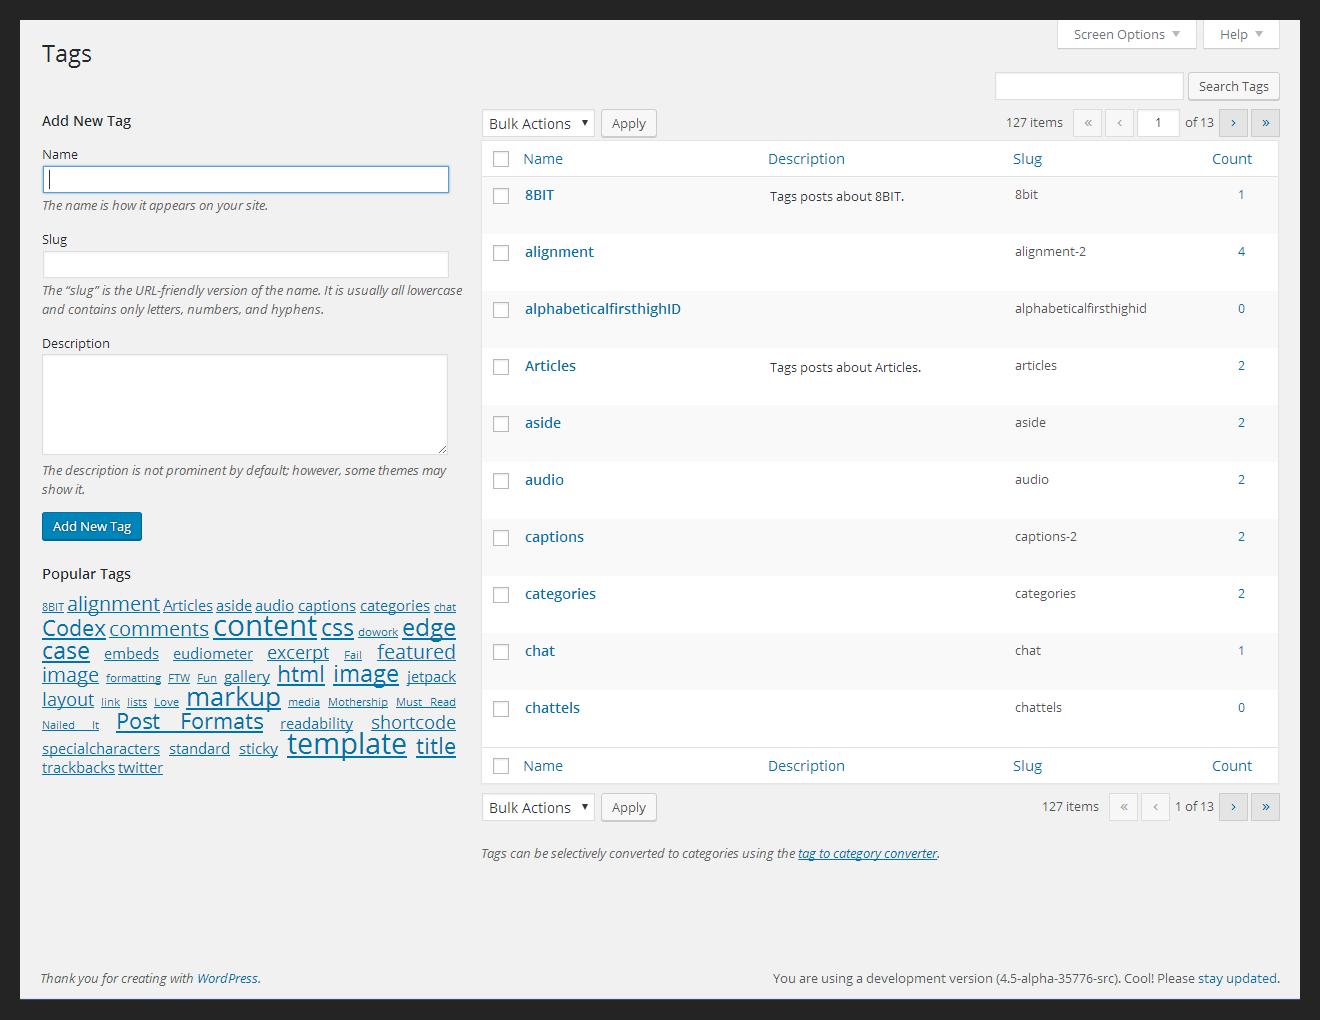 WordPress 4.6 Tag Management Screen